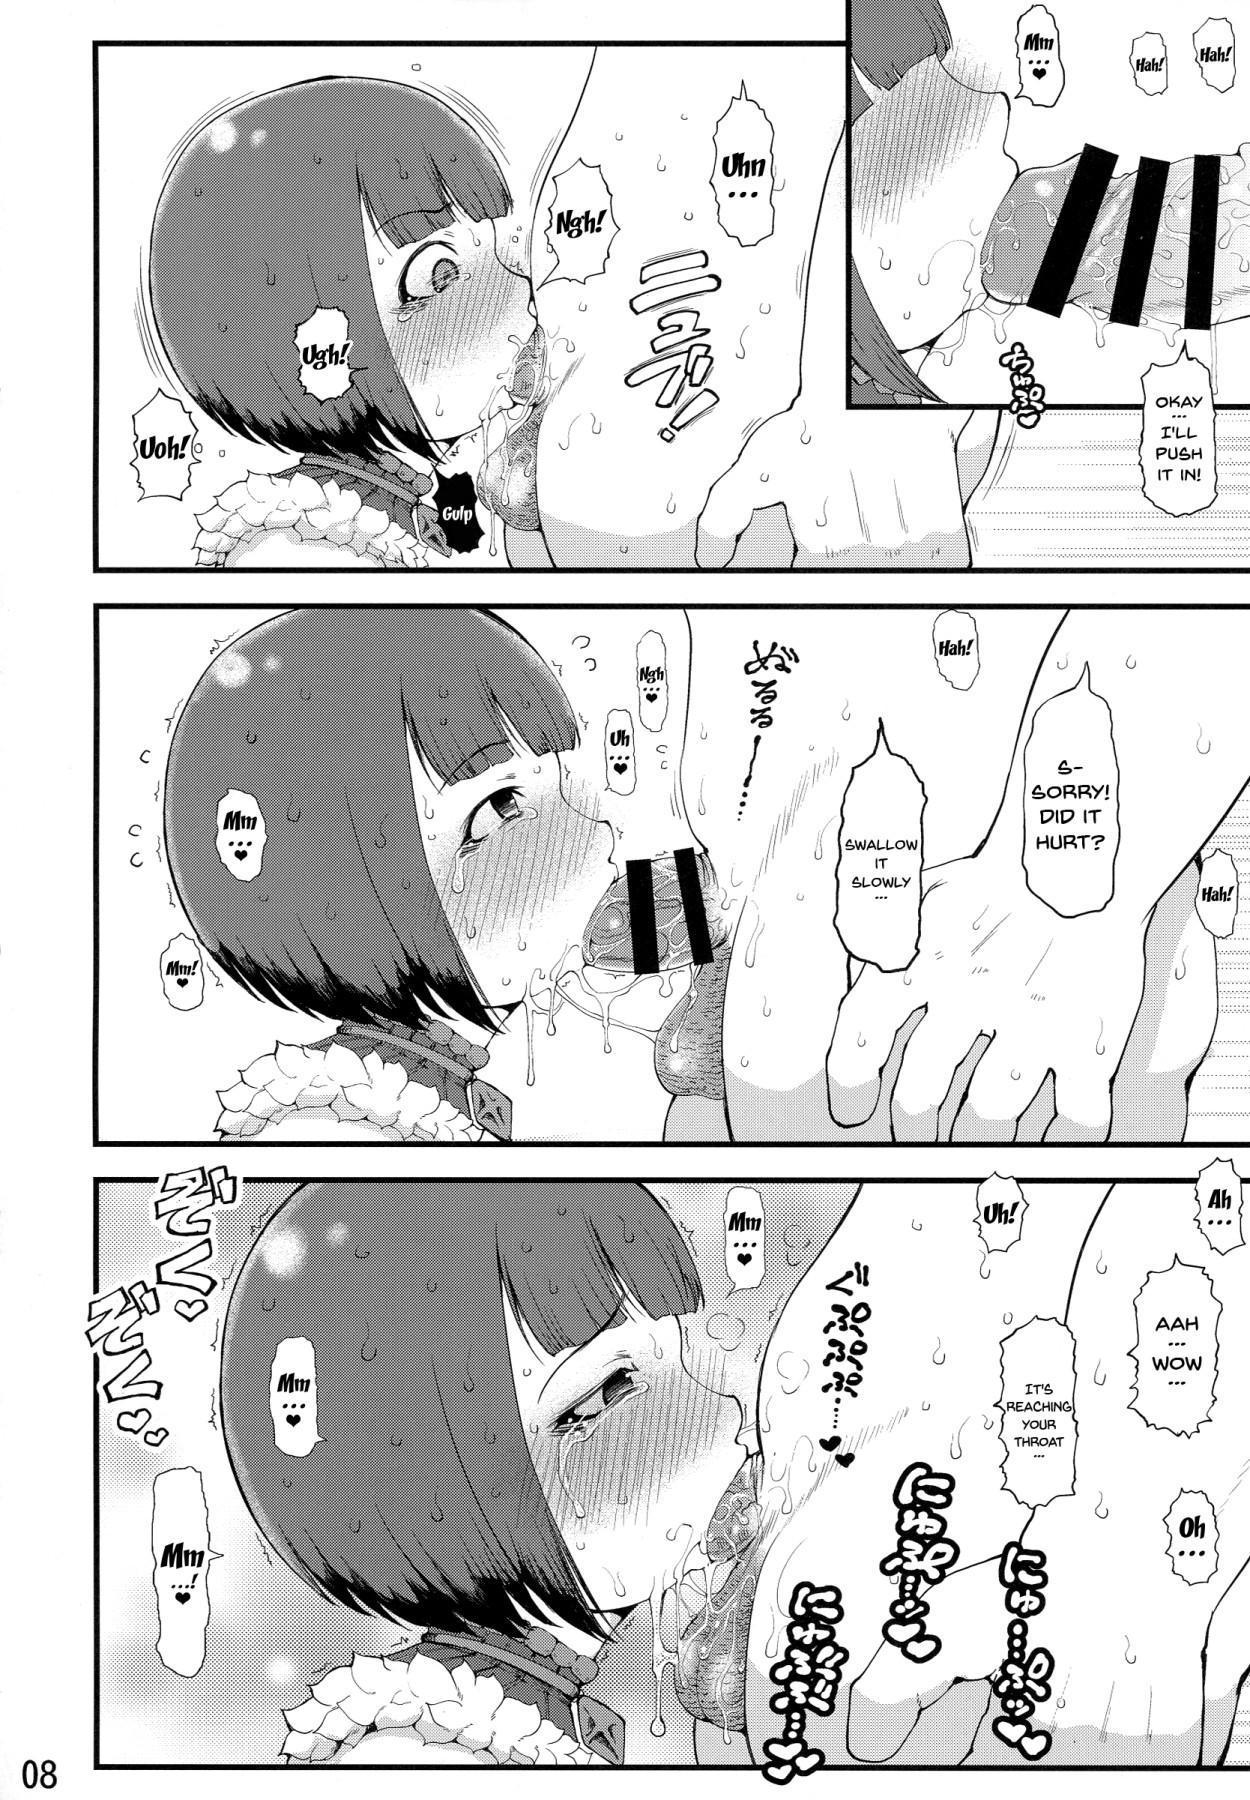 Karyuudo no Taieki   A Hunter's Body Fluids 5